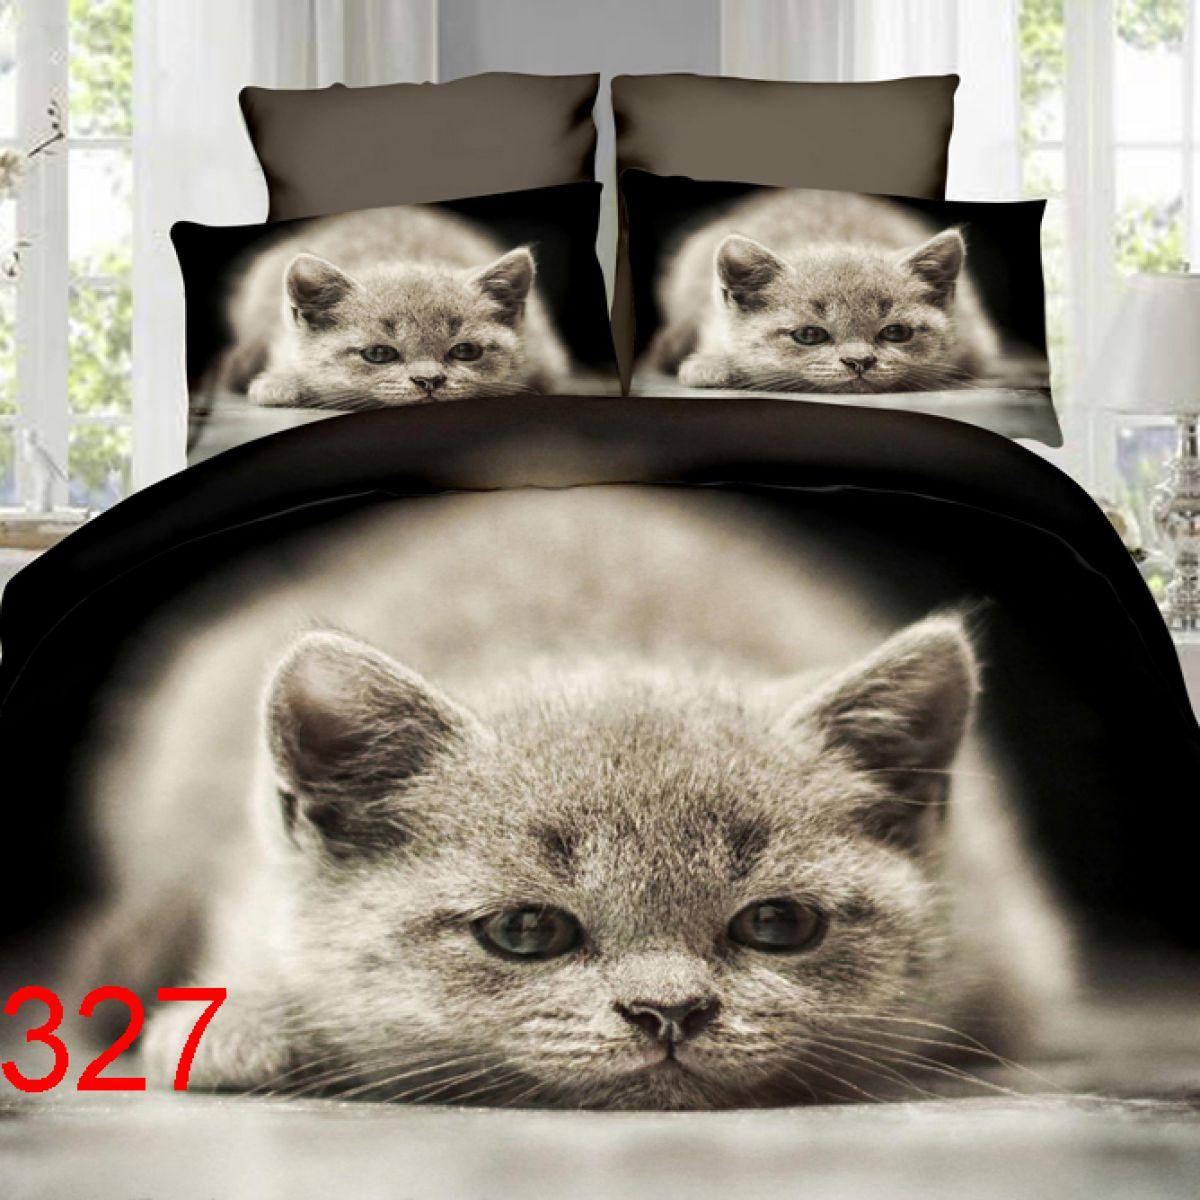 3D Beddings - Antonio - AML-327z - 160x200 cm - 4 pcs